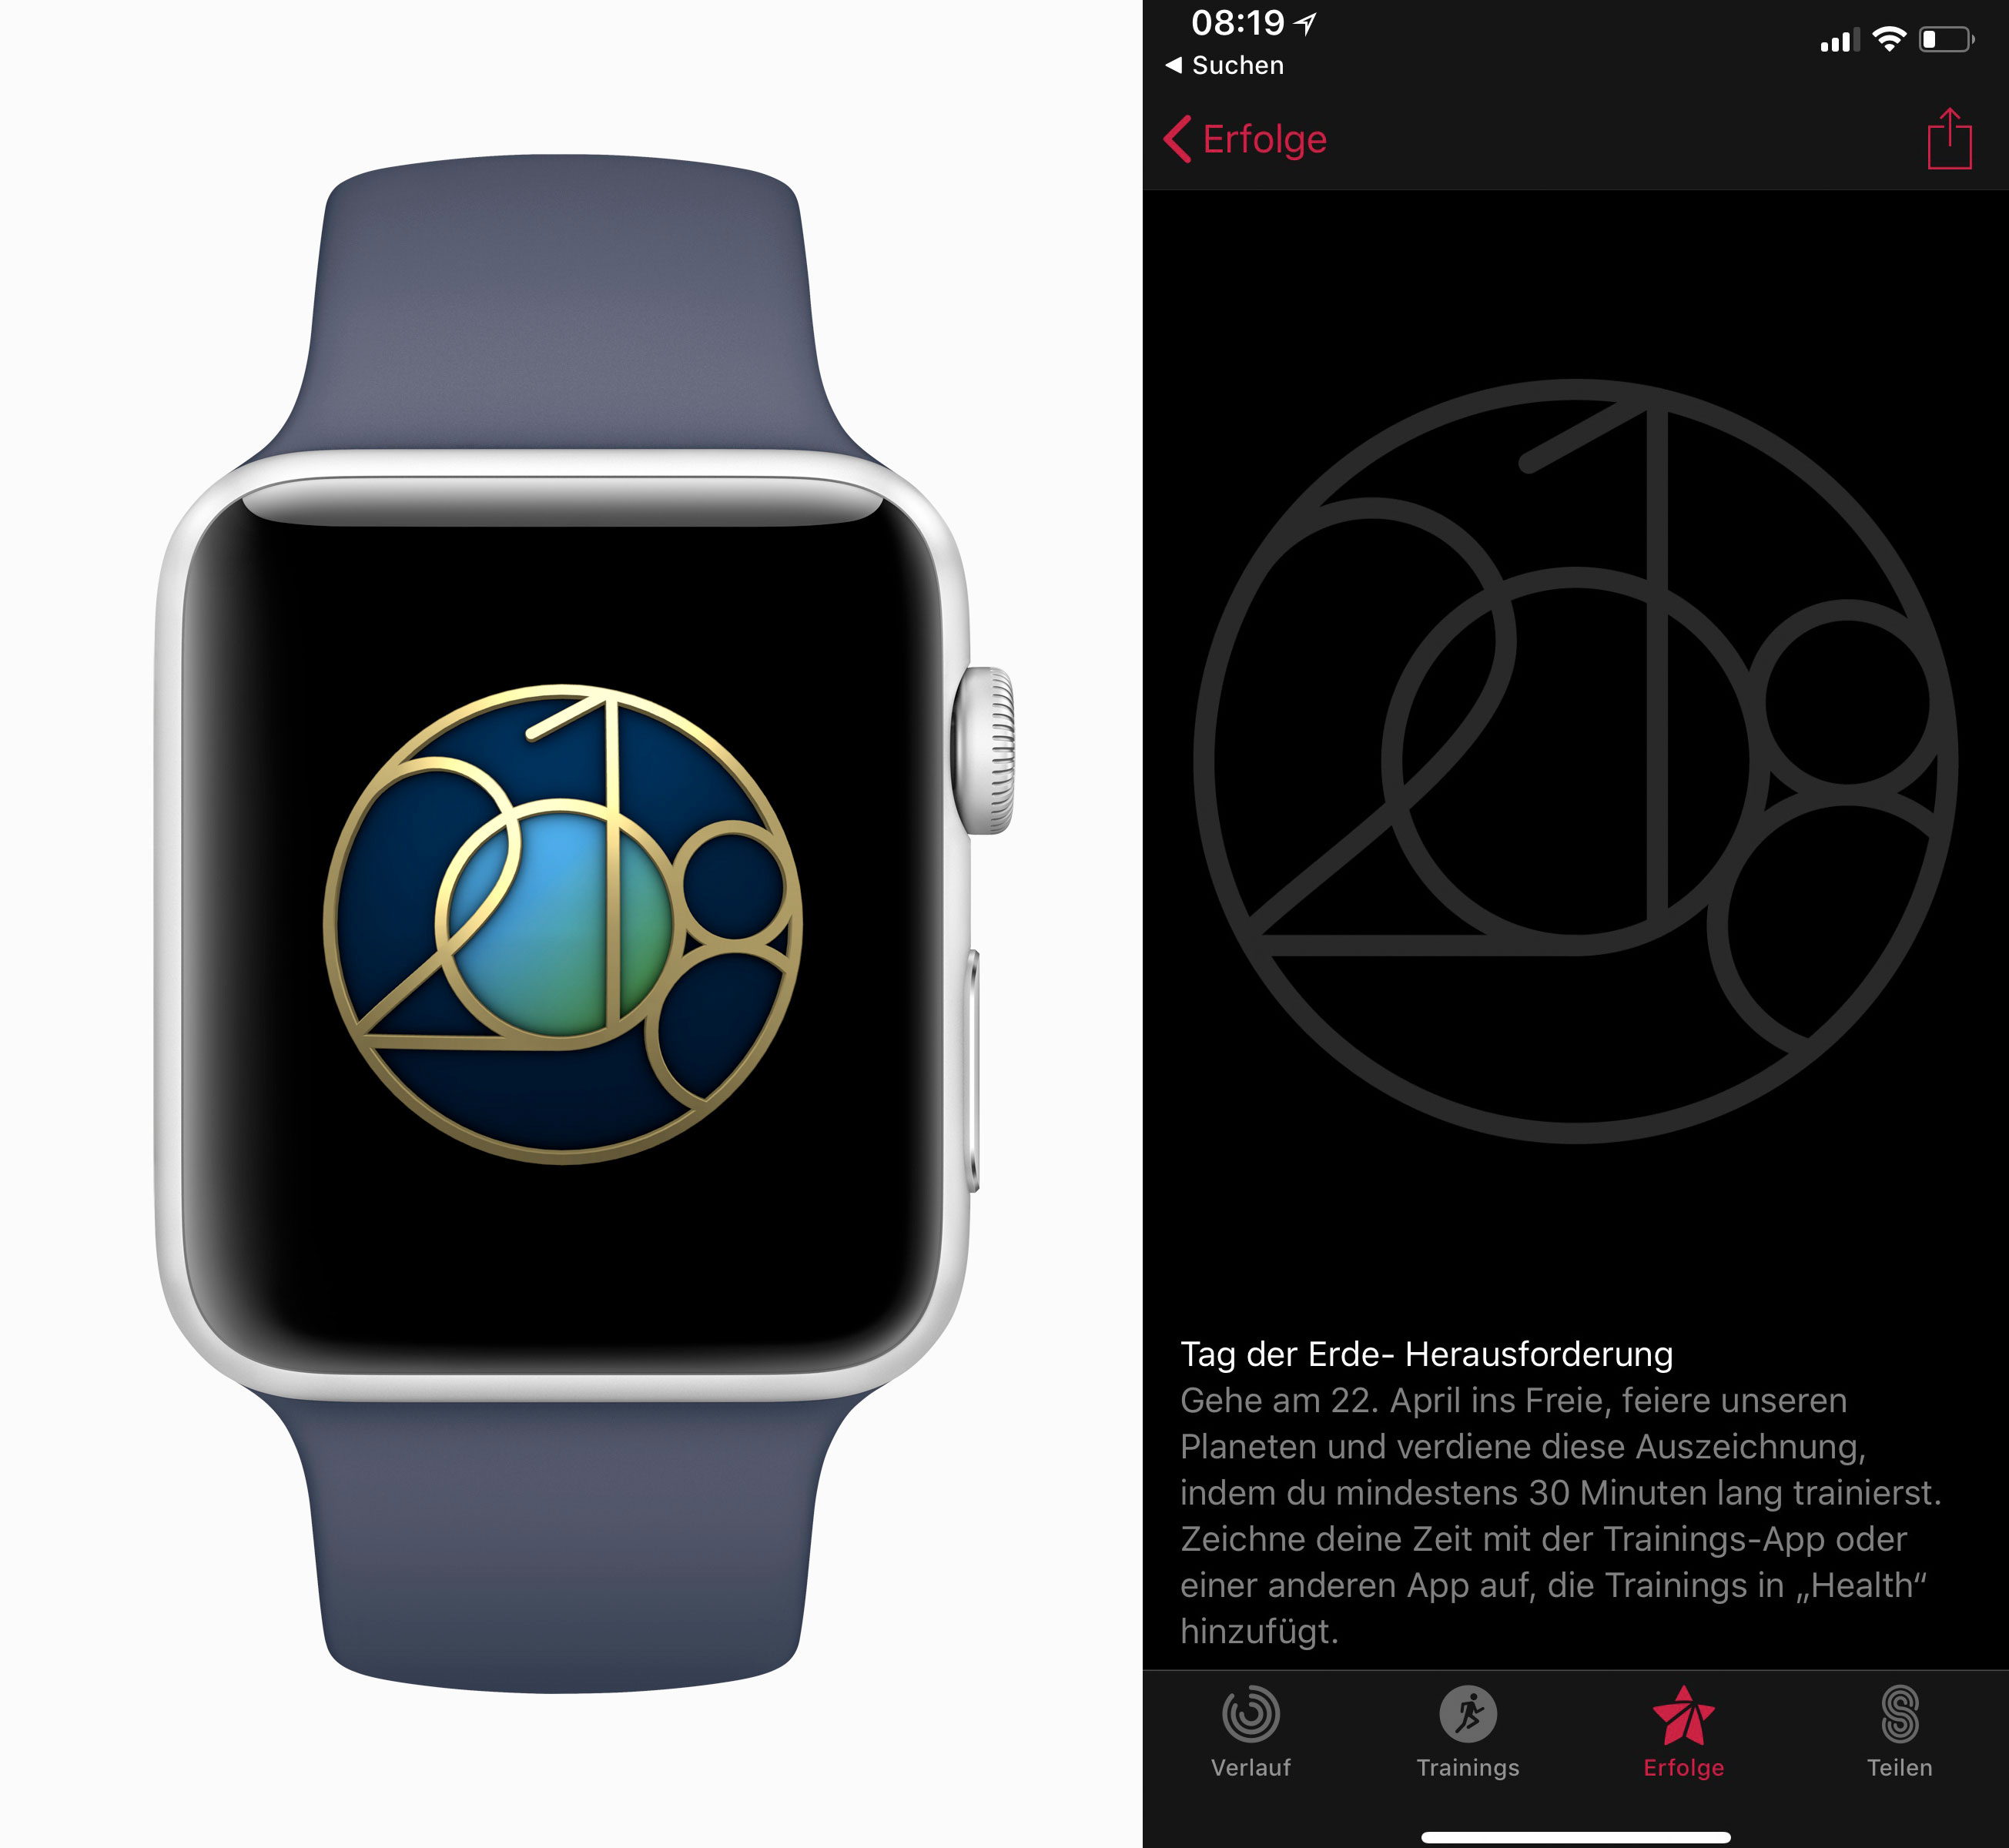 Apple Watch Erfolg